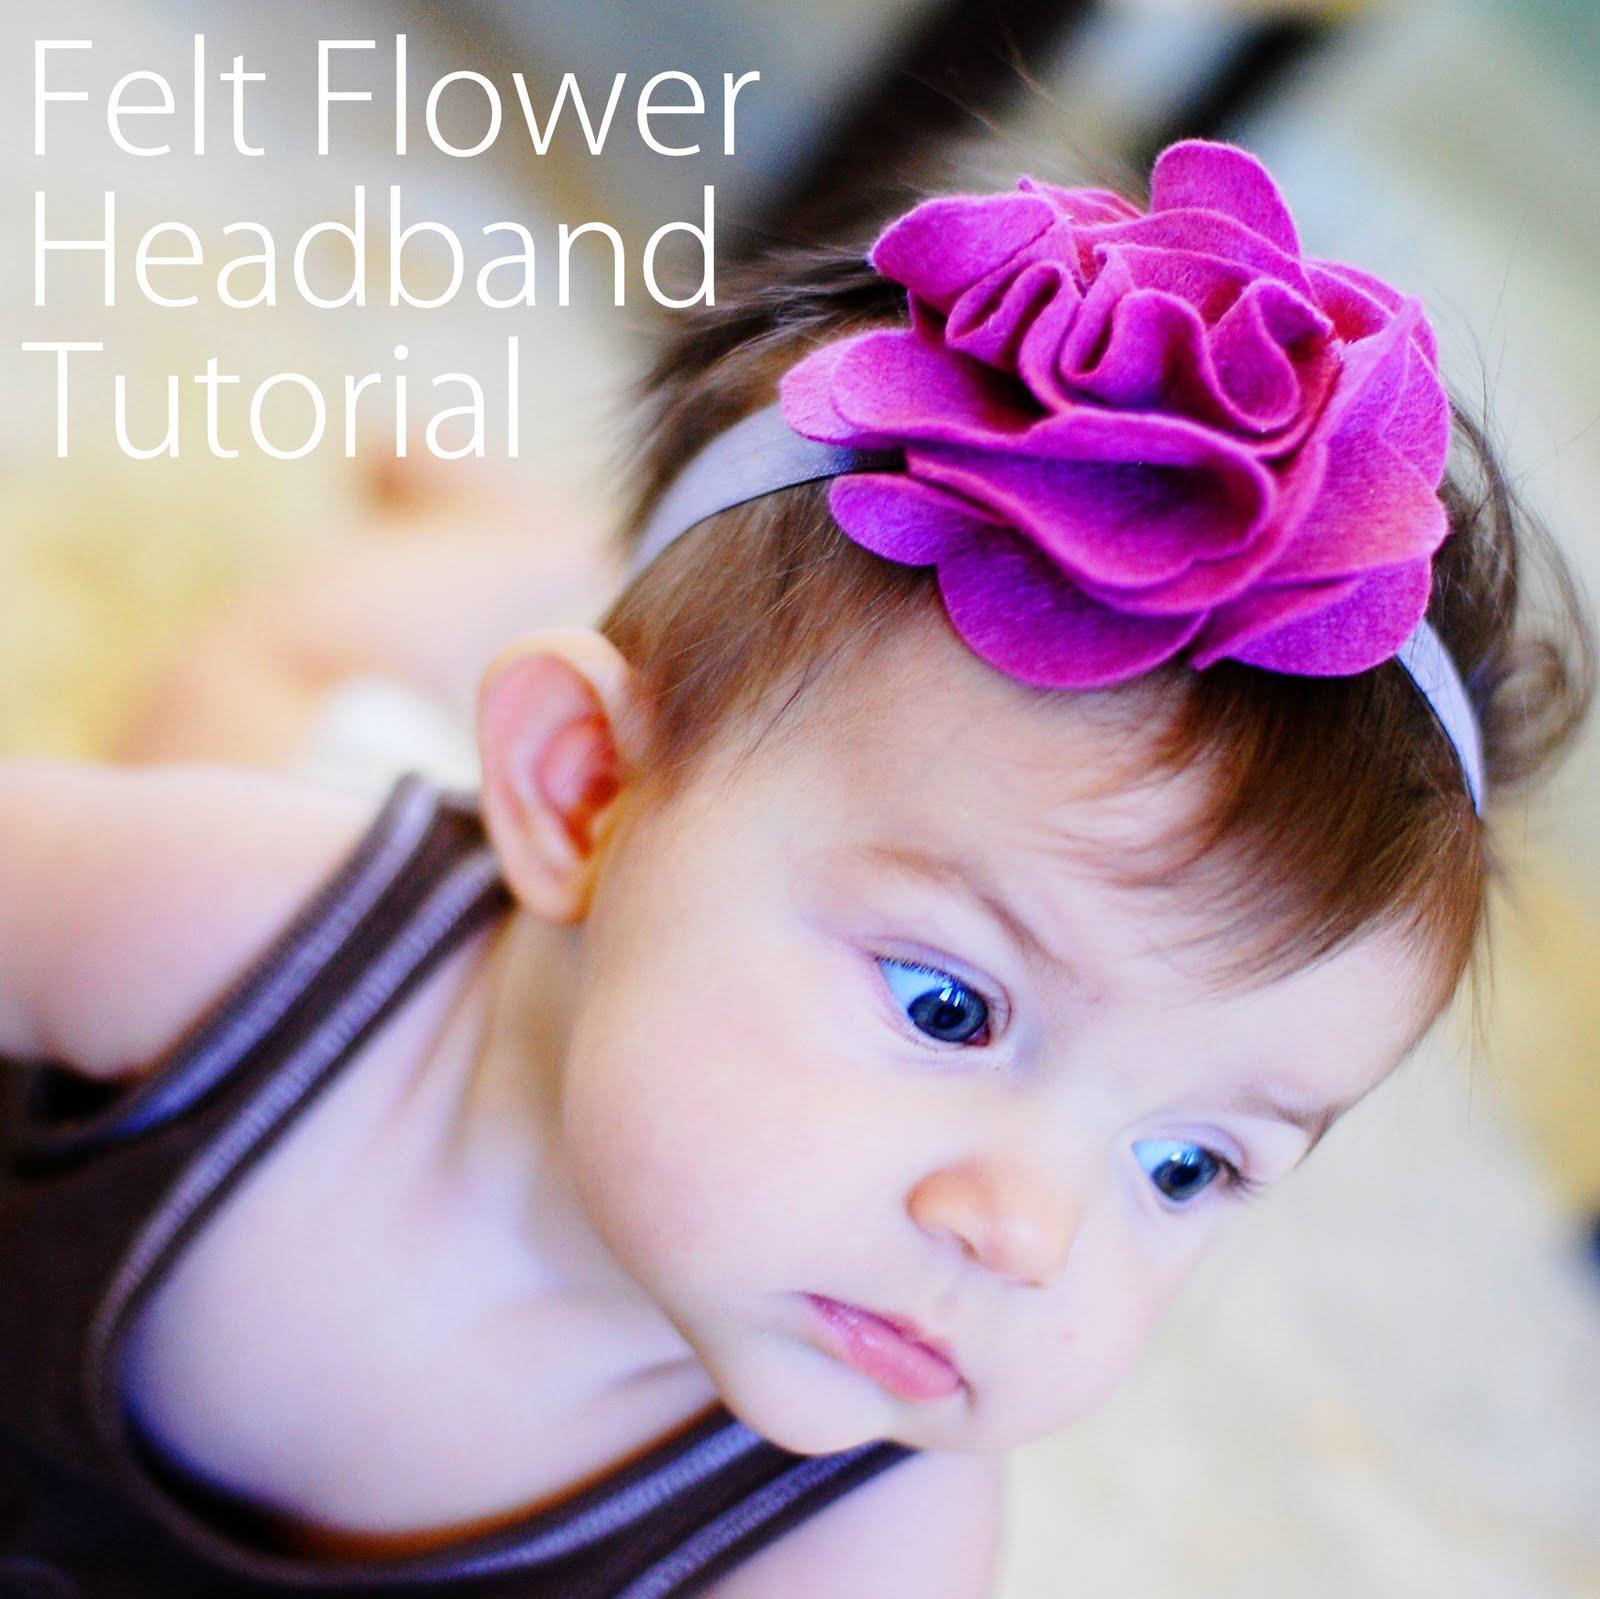 Free Baby Projects: Felt Flower Headband